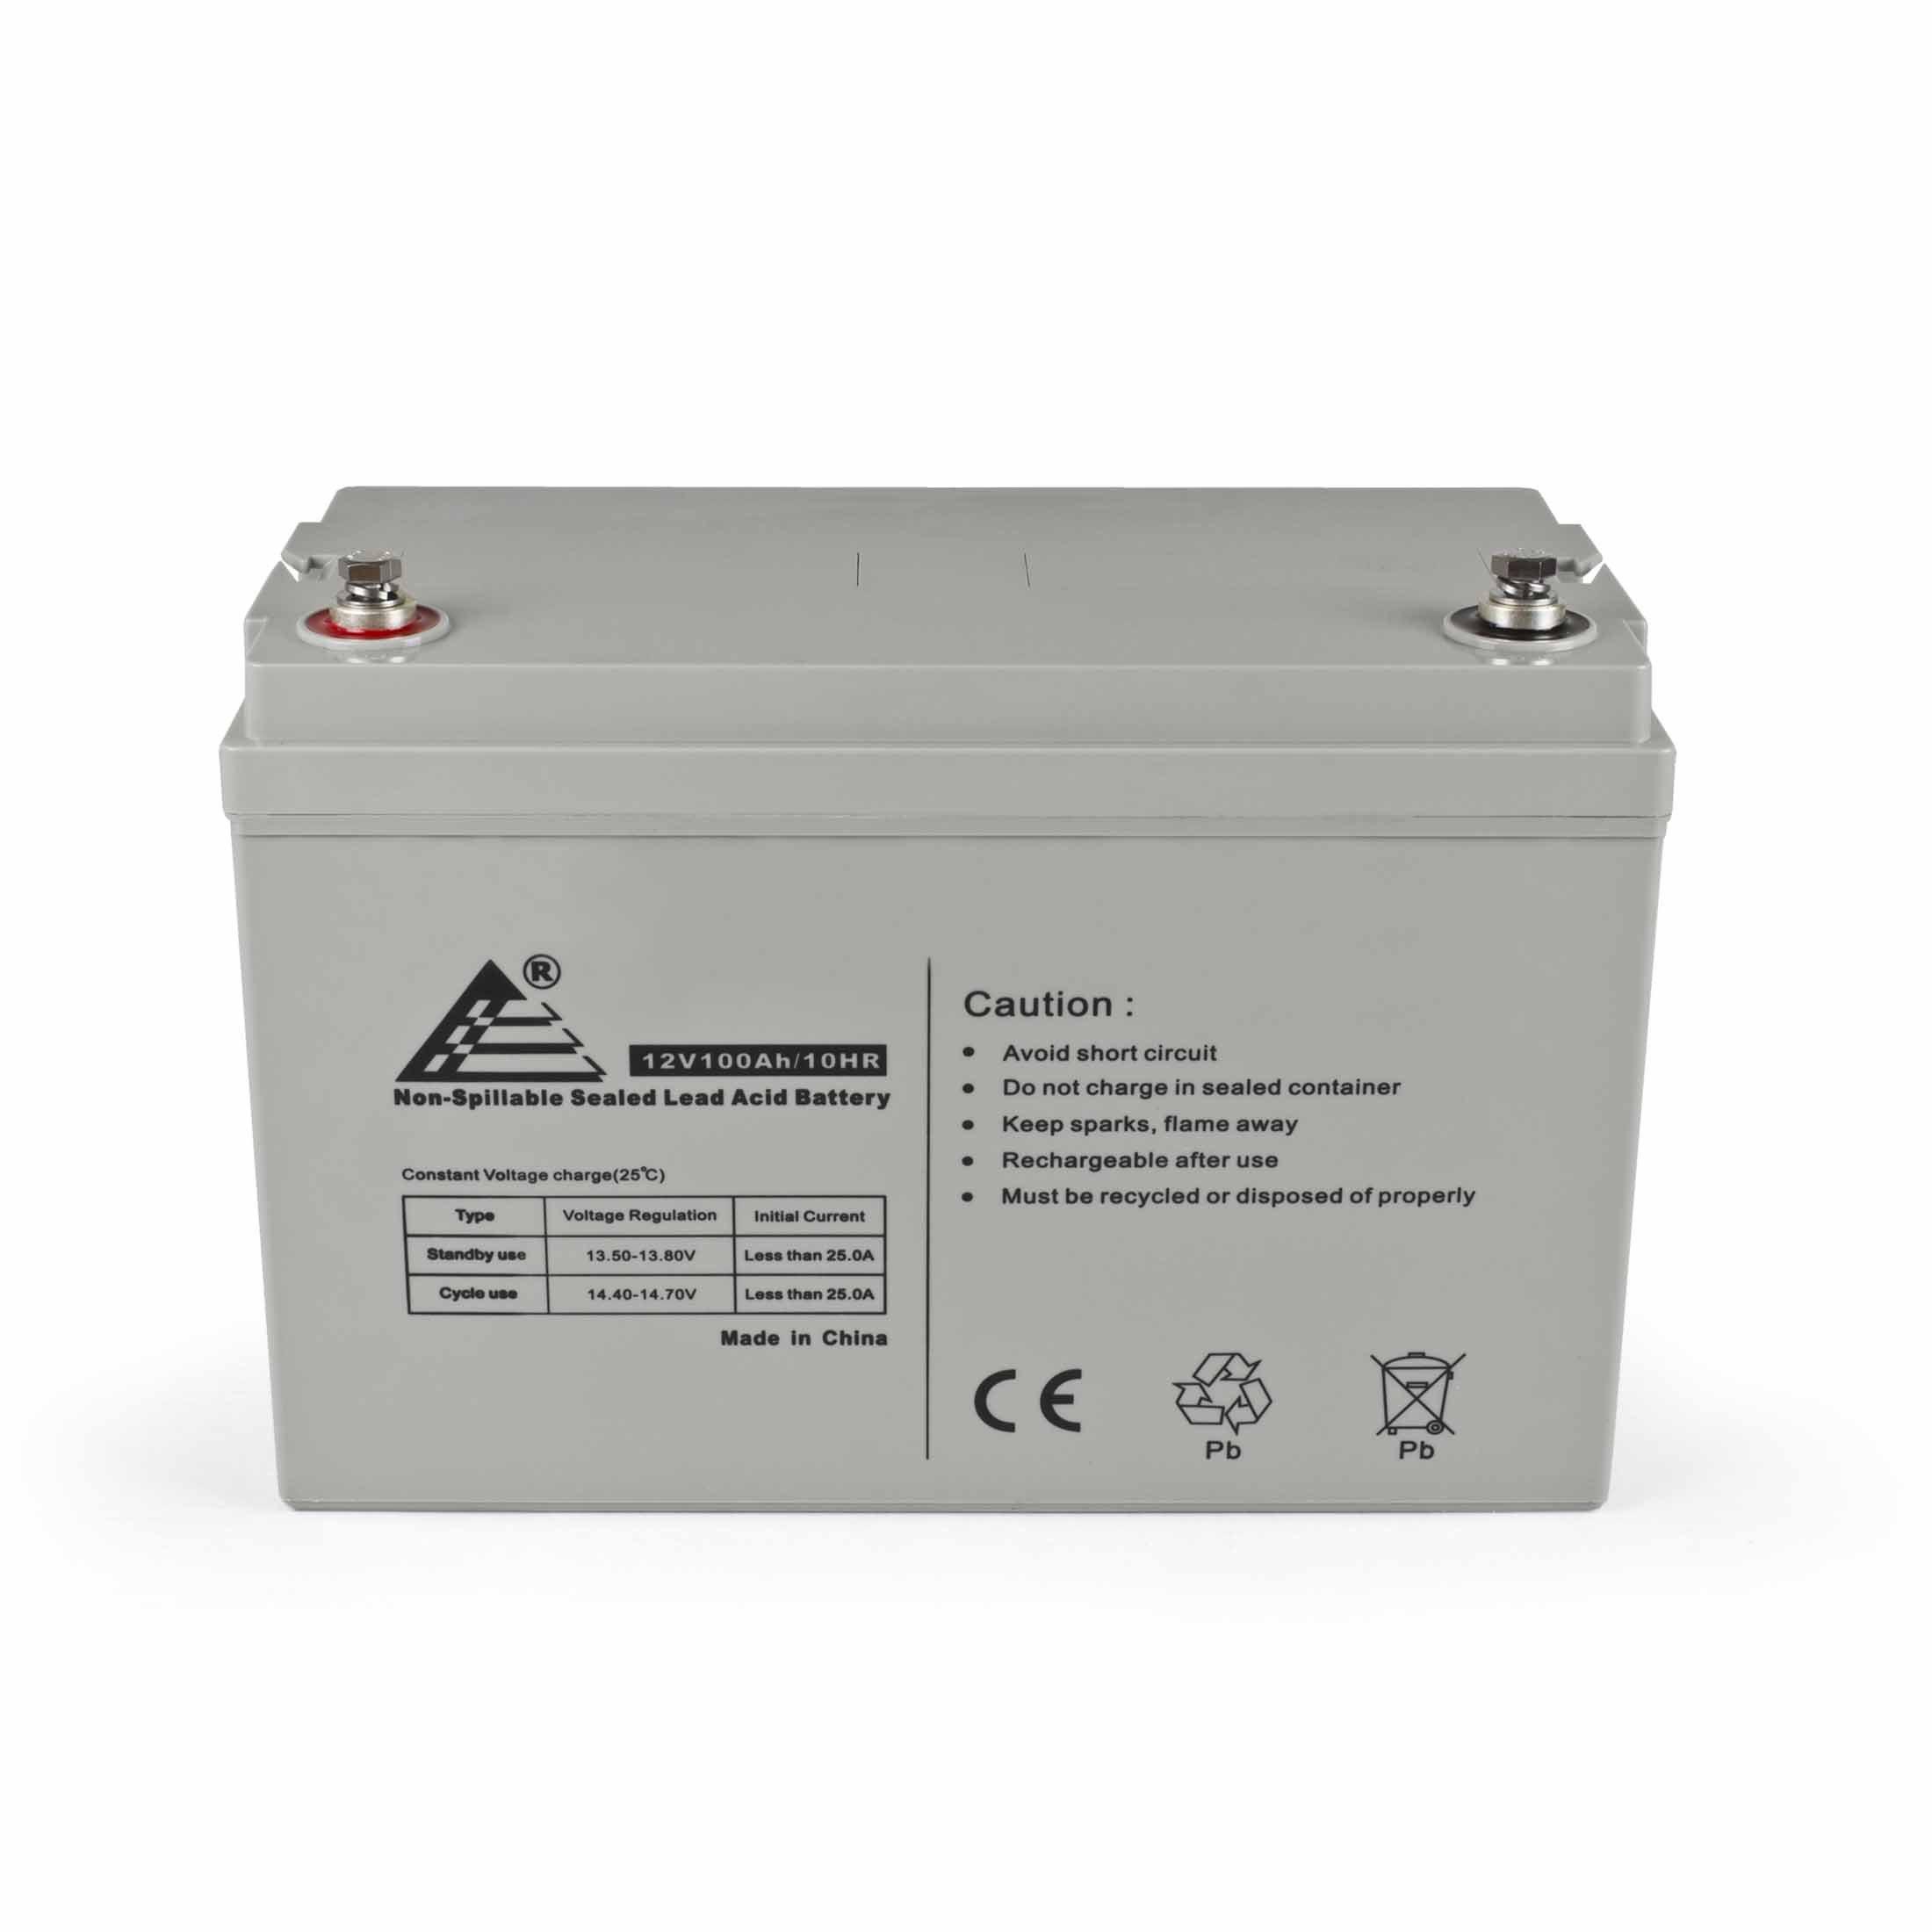 ExpertPower 12V 100Ah Solar Wind Power AGM Sealed Lead Acid Battery, 65 Pound